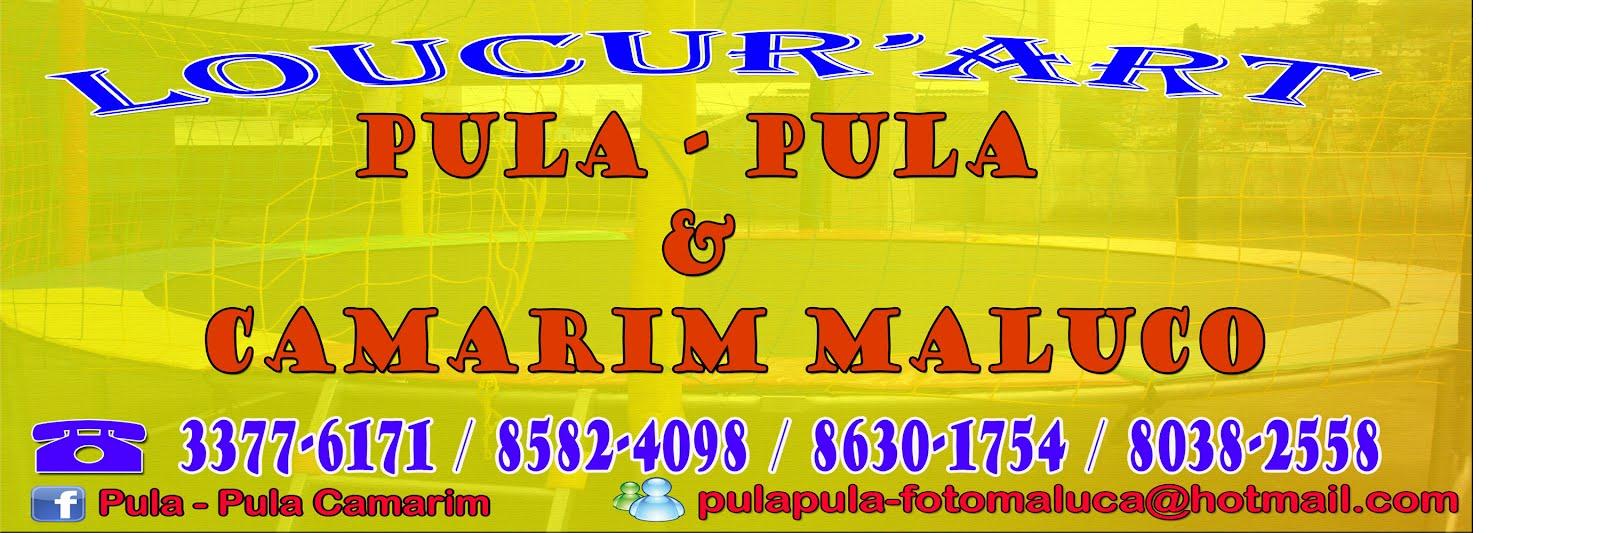 Loucur'art Pula - Pula & Camarim Maluco